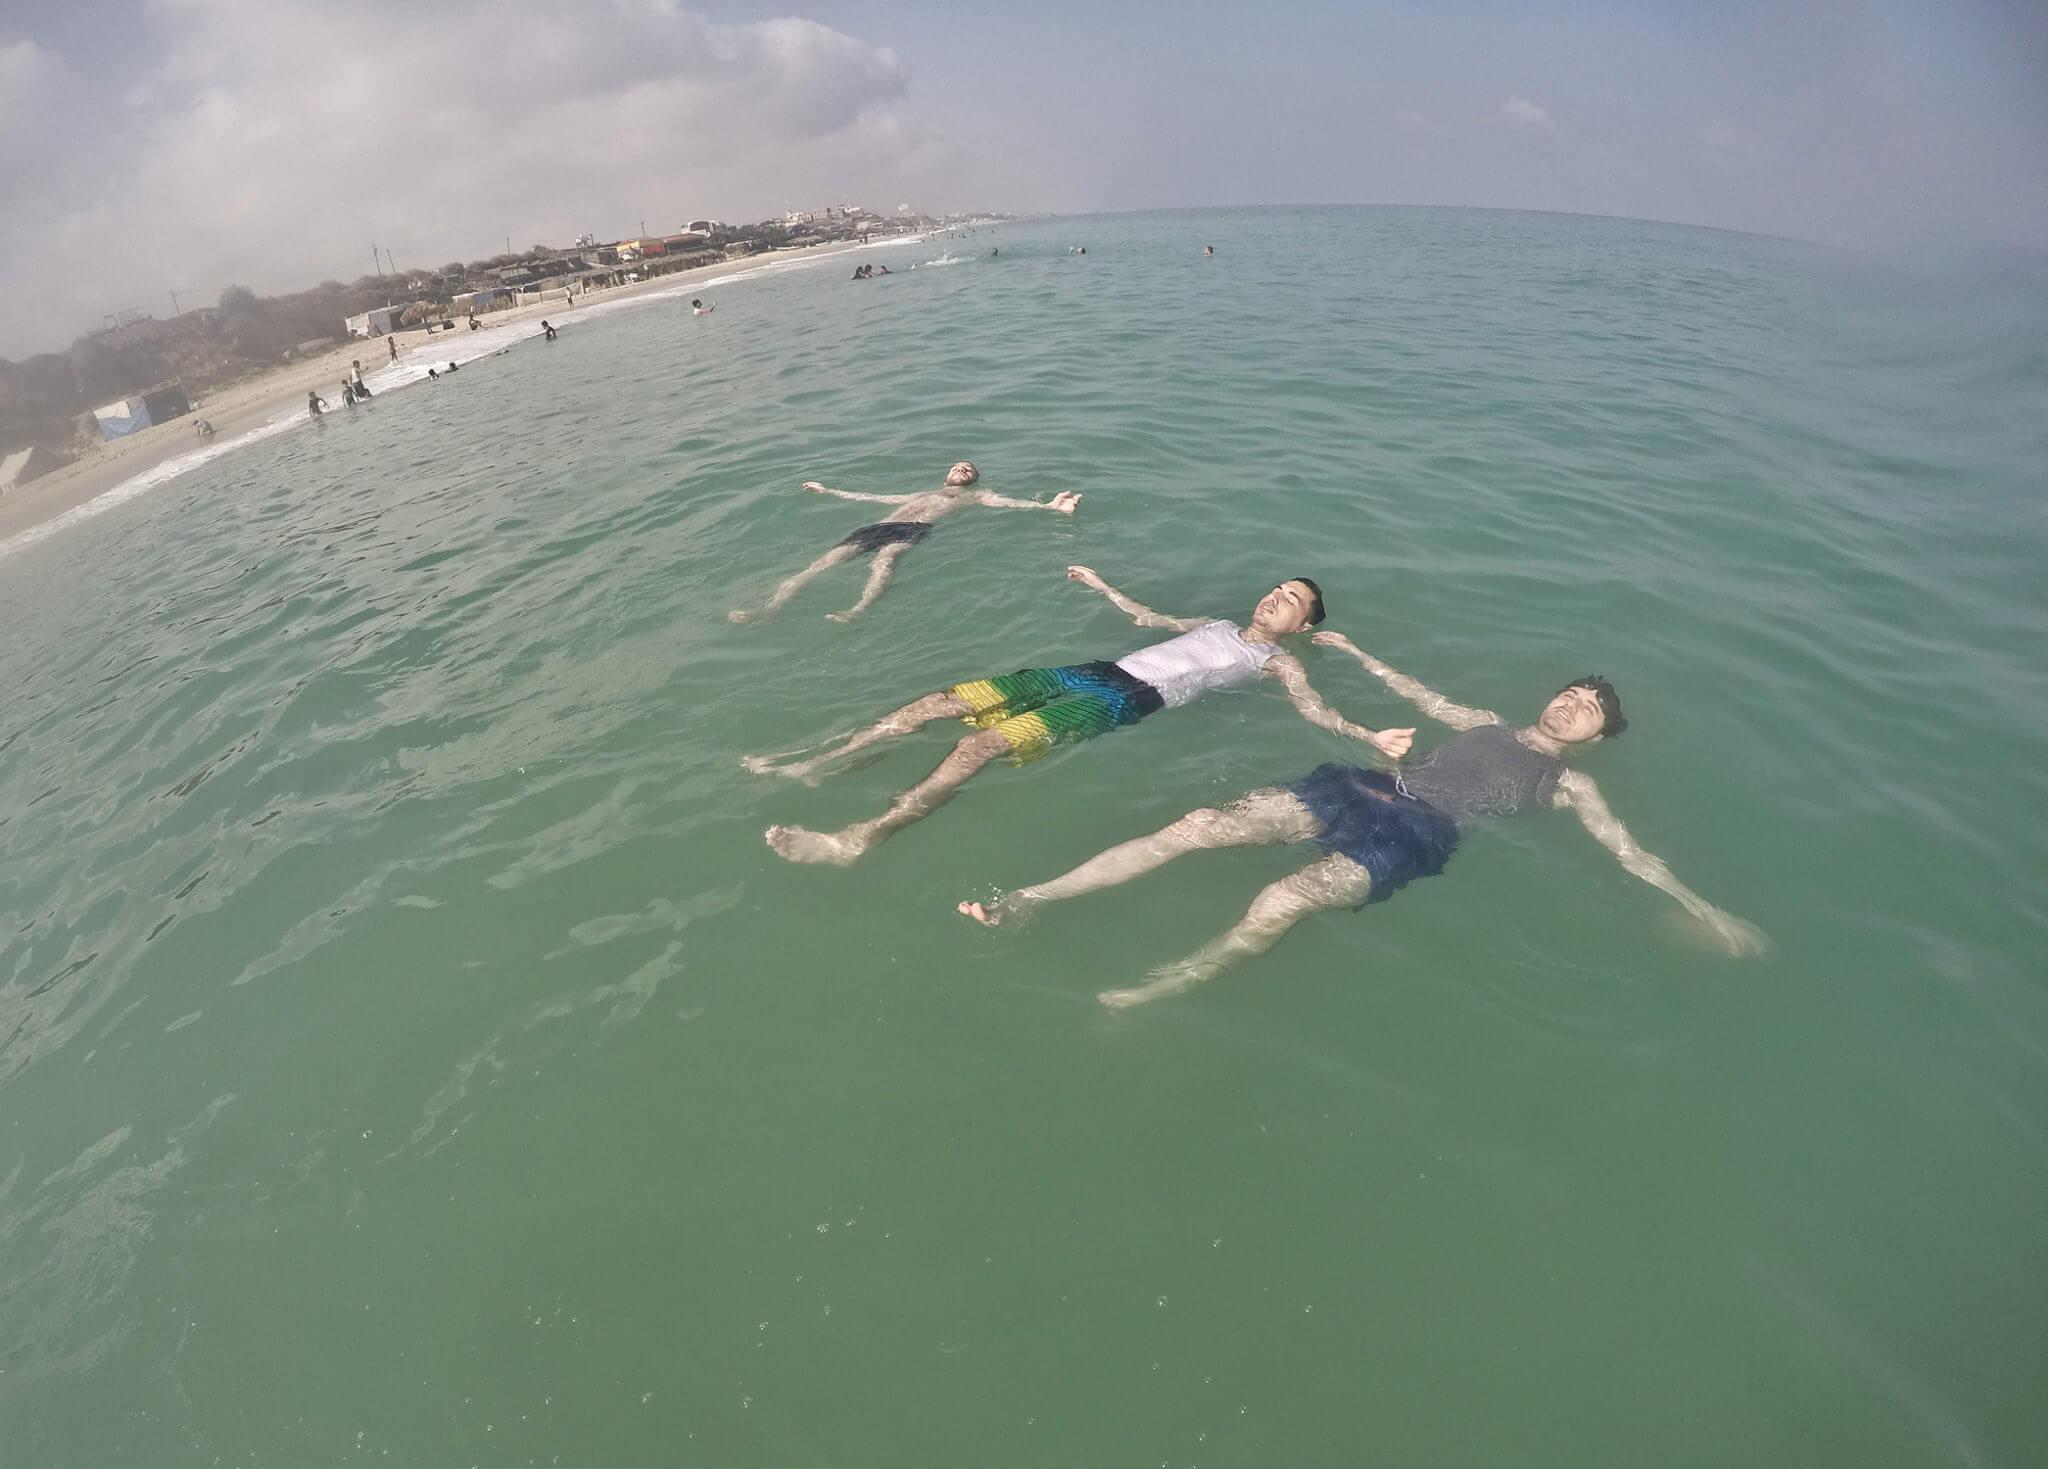 Palestinian beach goers enjoy swimming in Gaza, in the Mediterranean Sea.